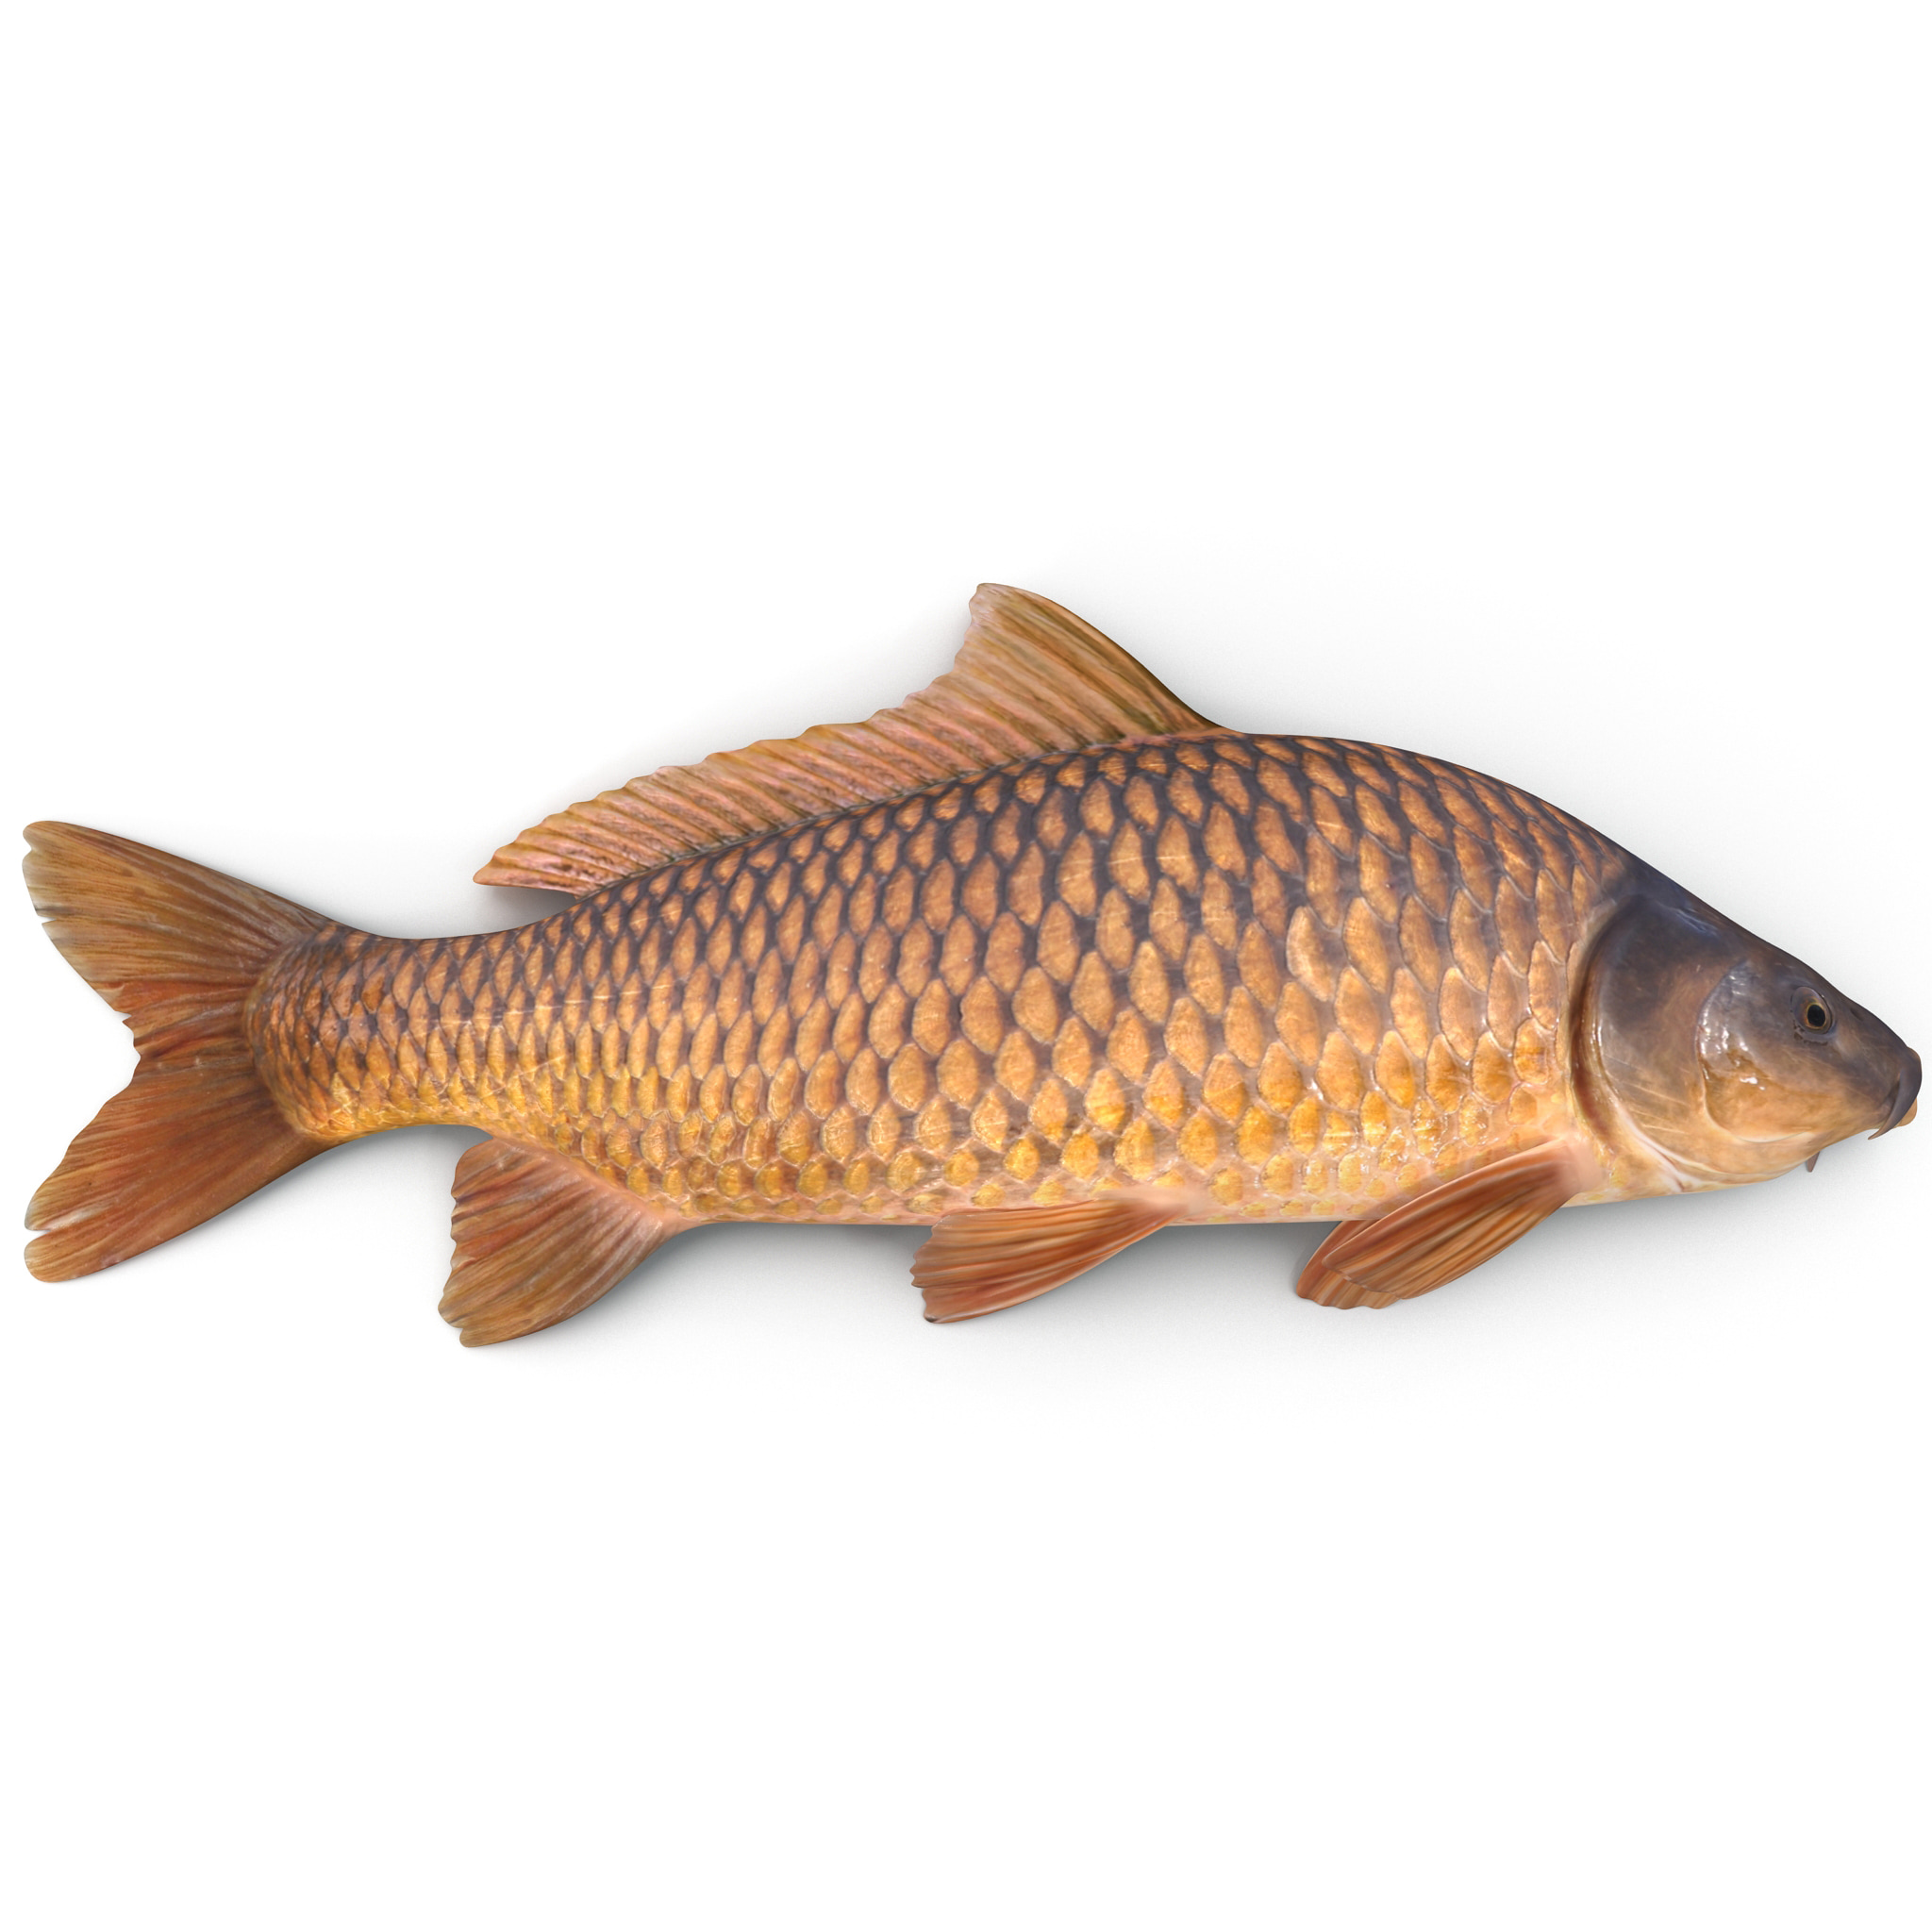 carp fish max